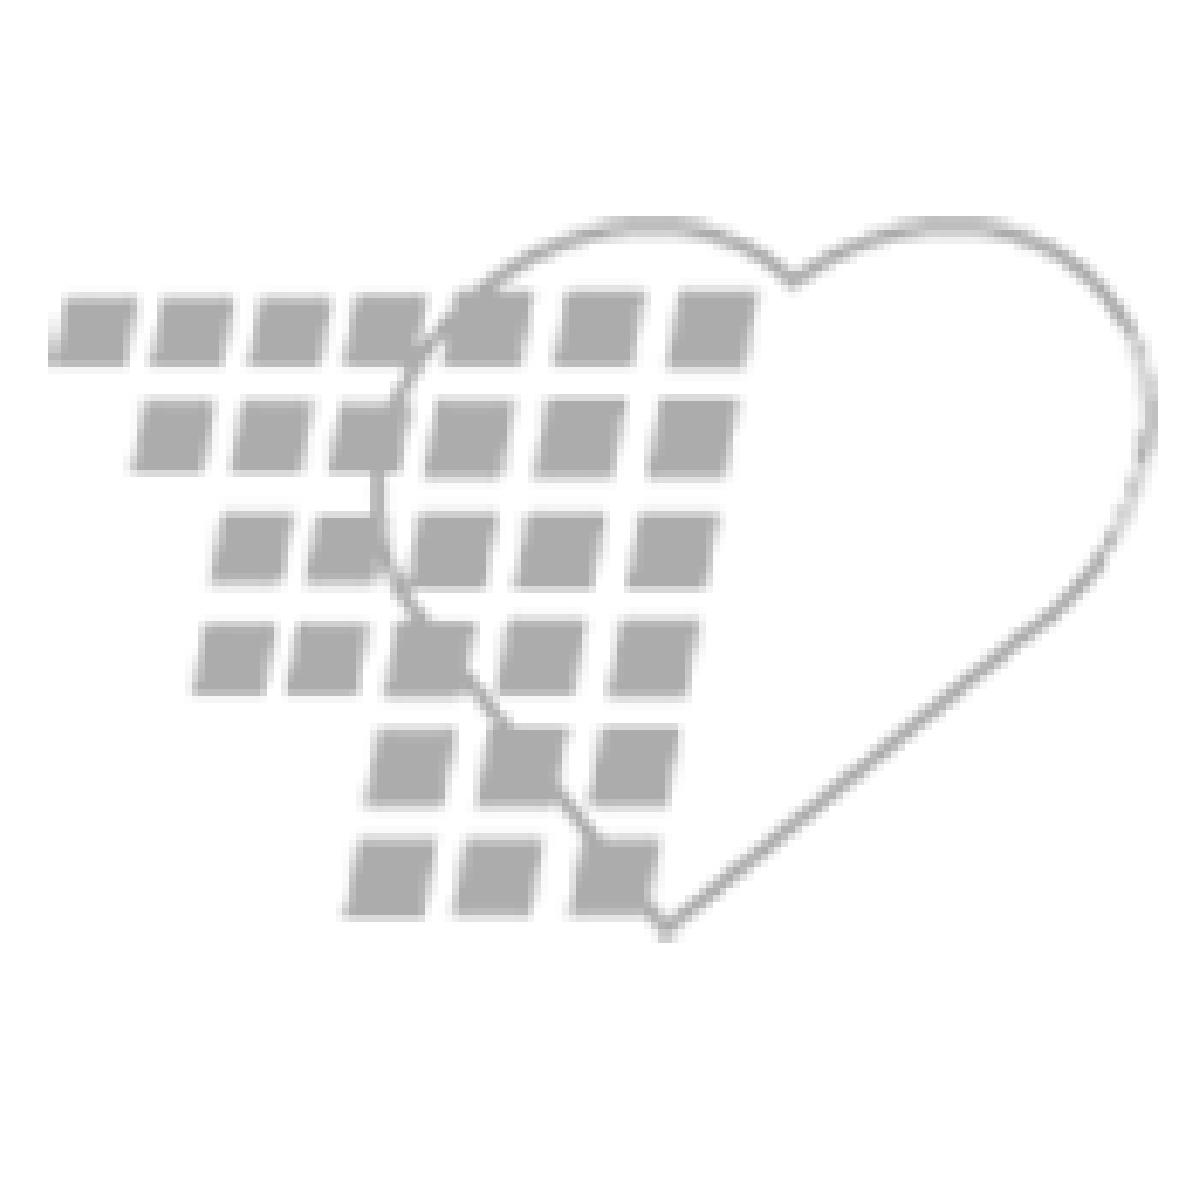 02-20-2007-THI - Welch Allyn Thigh FlexiPort Reusable Cuff - Thigh